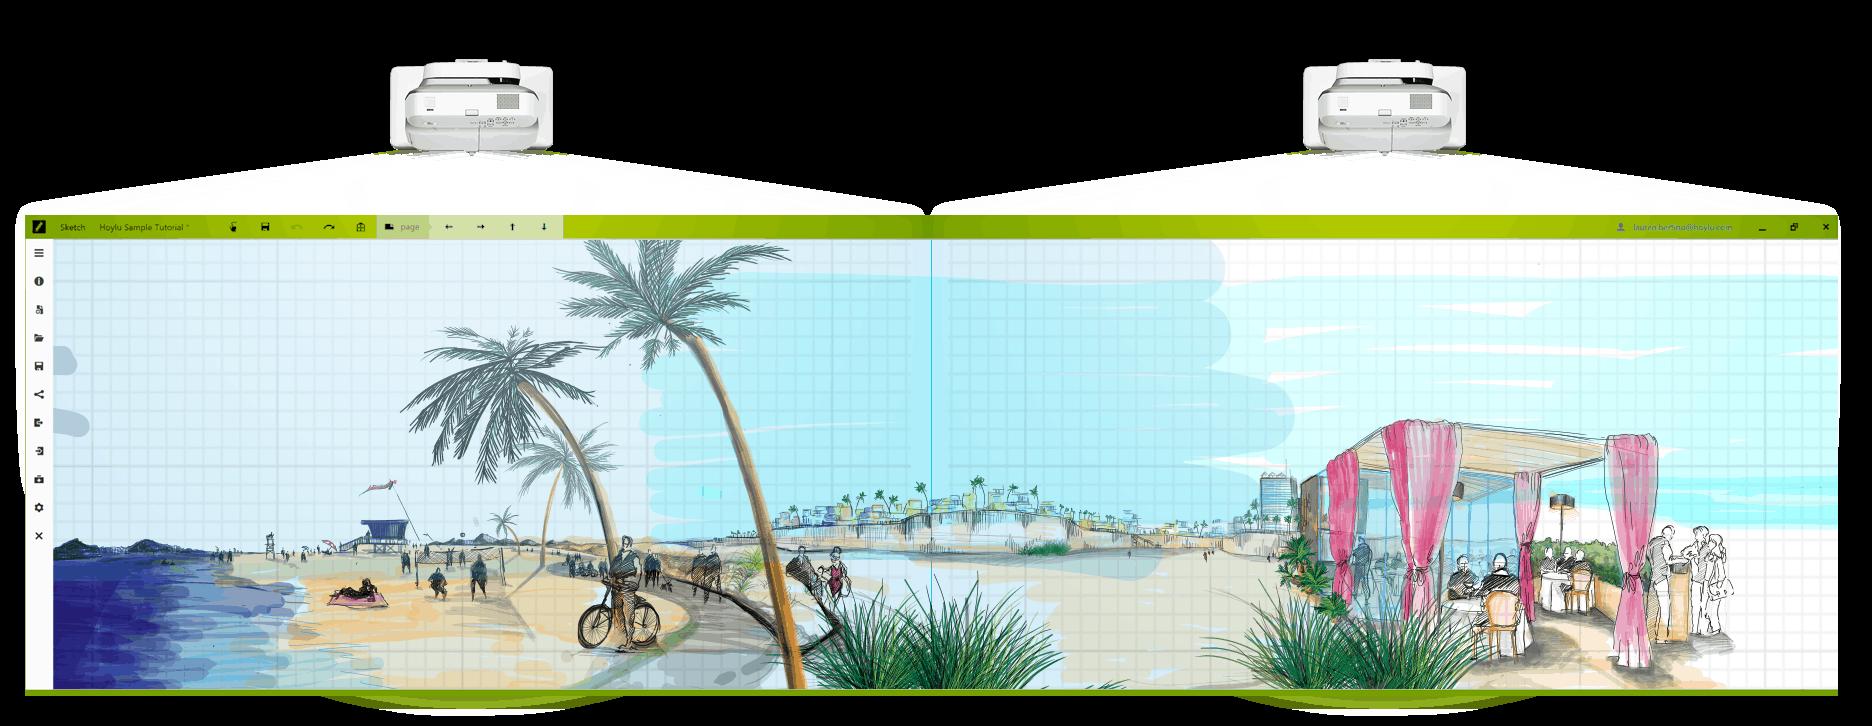 Hoylu Connected Workspaces™ application beach scene sketch displayed on HoyluWall digital board